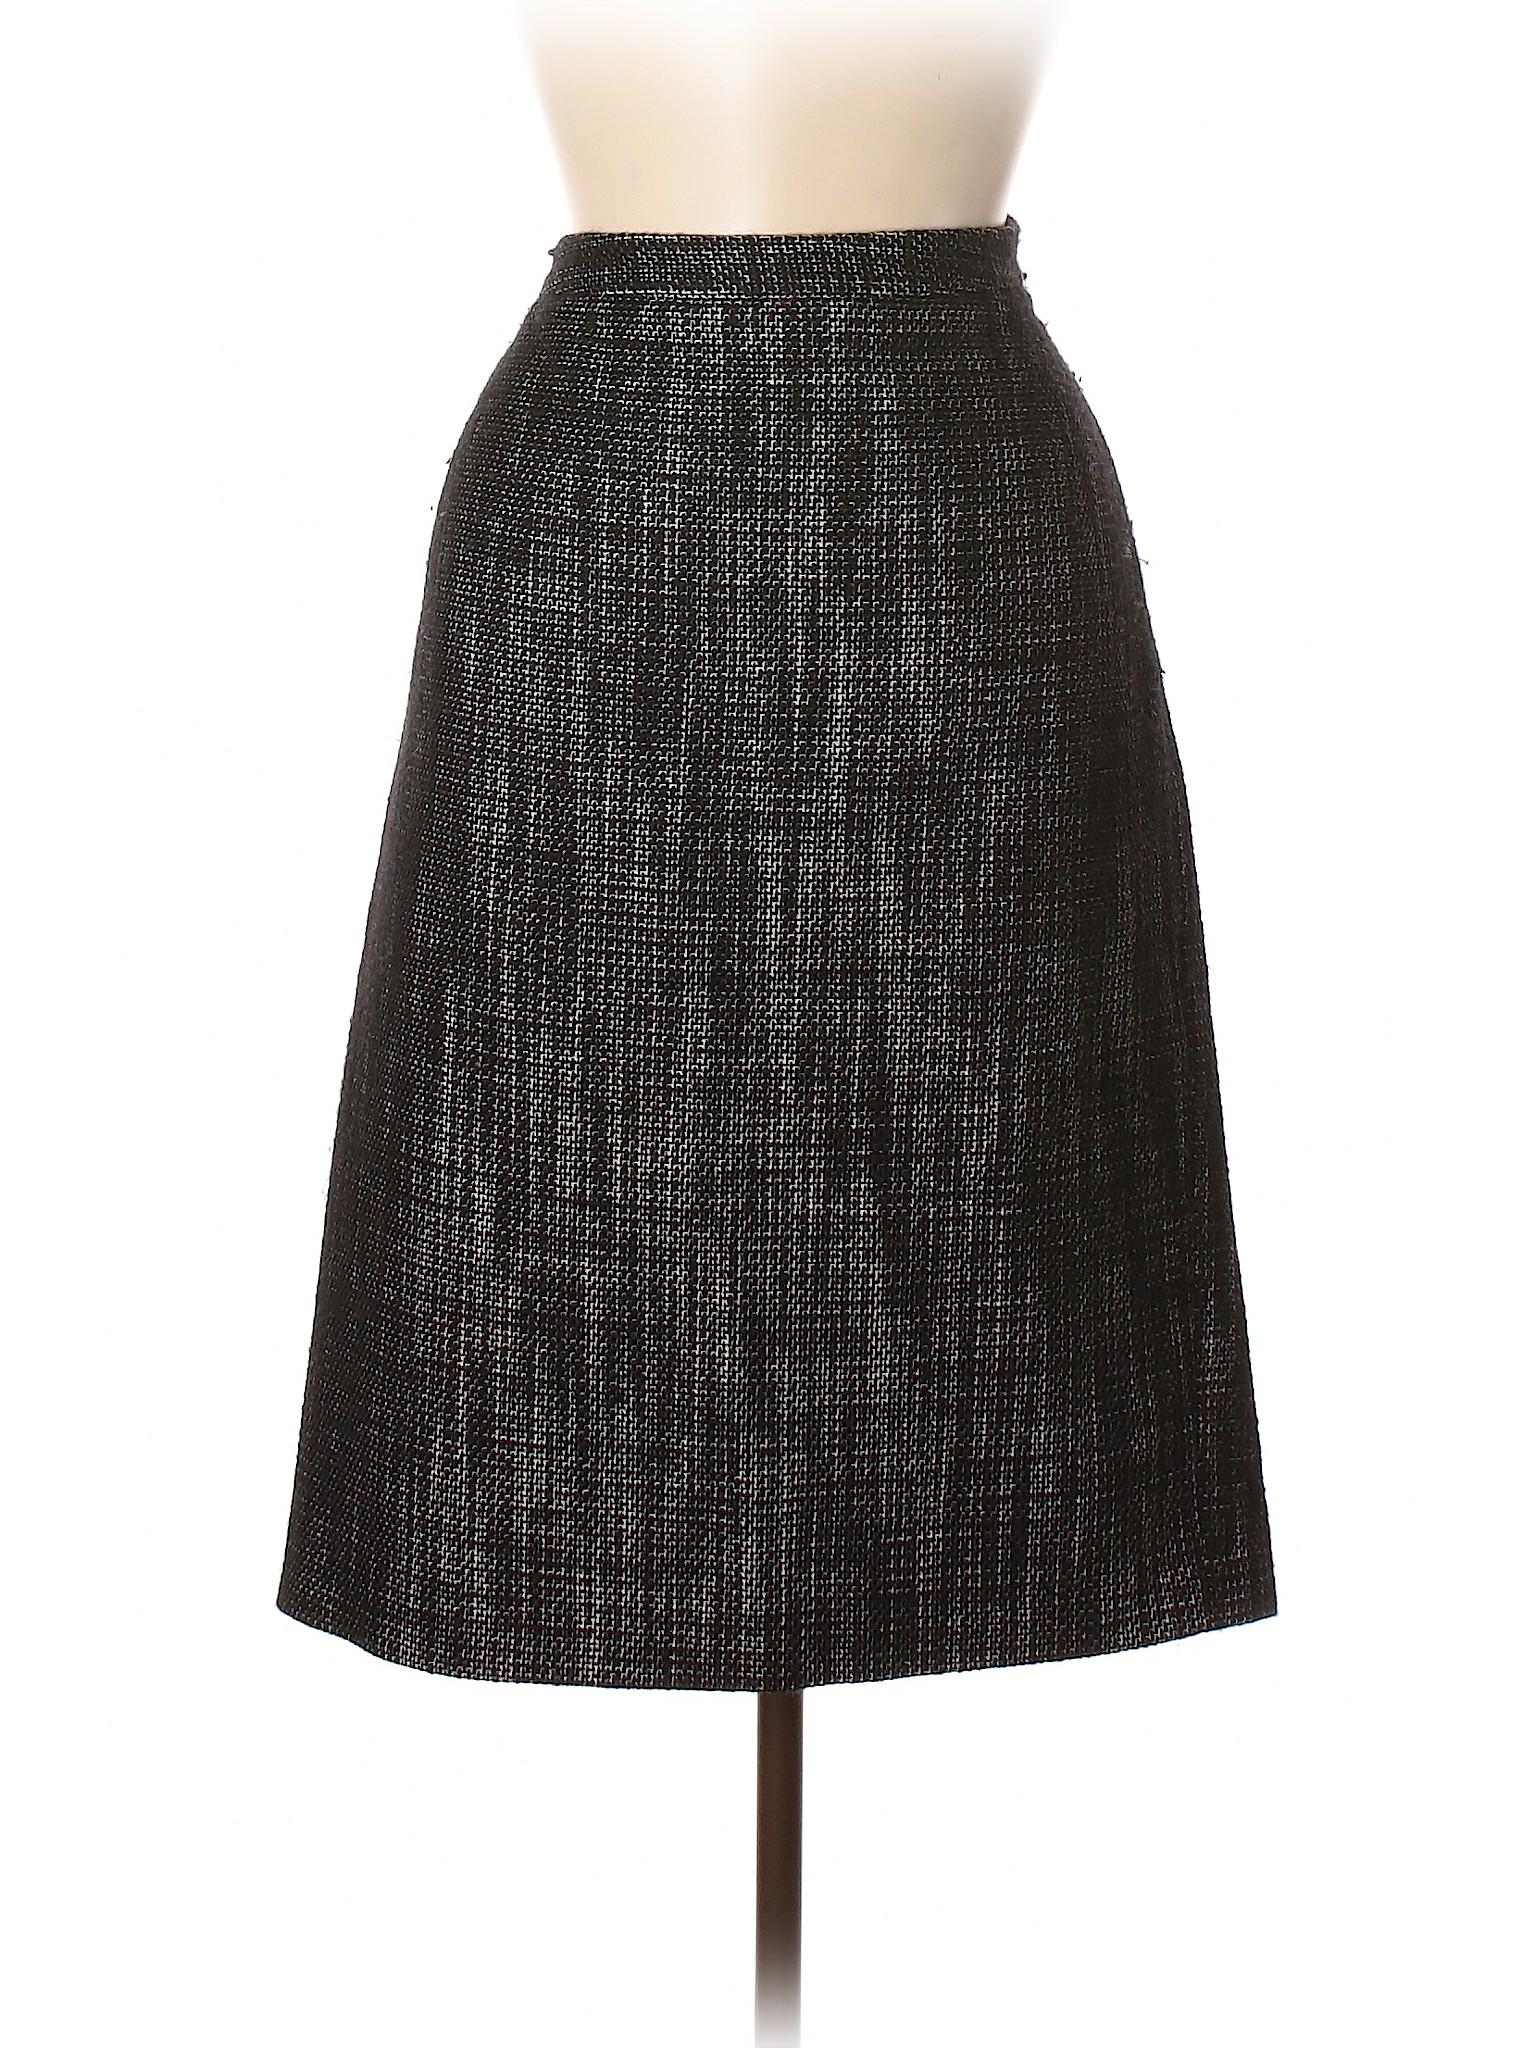 Skirt Wool Skirt Wool Boutique Wool Boutique Wool Boutique Boutique Skirt zqRwOO